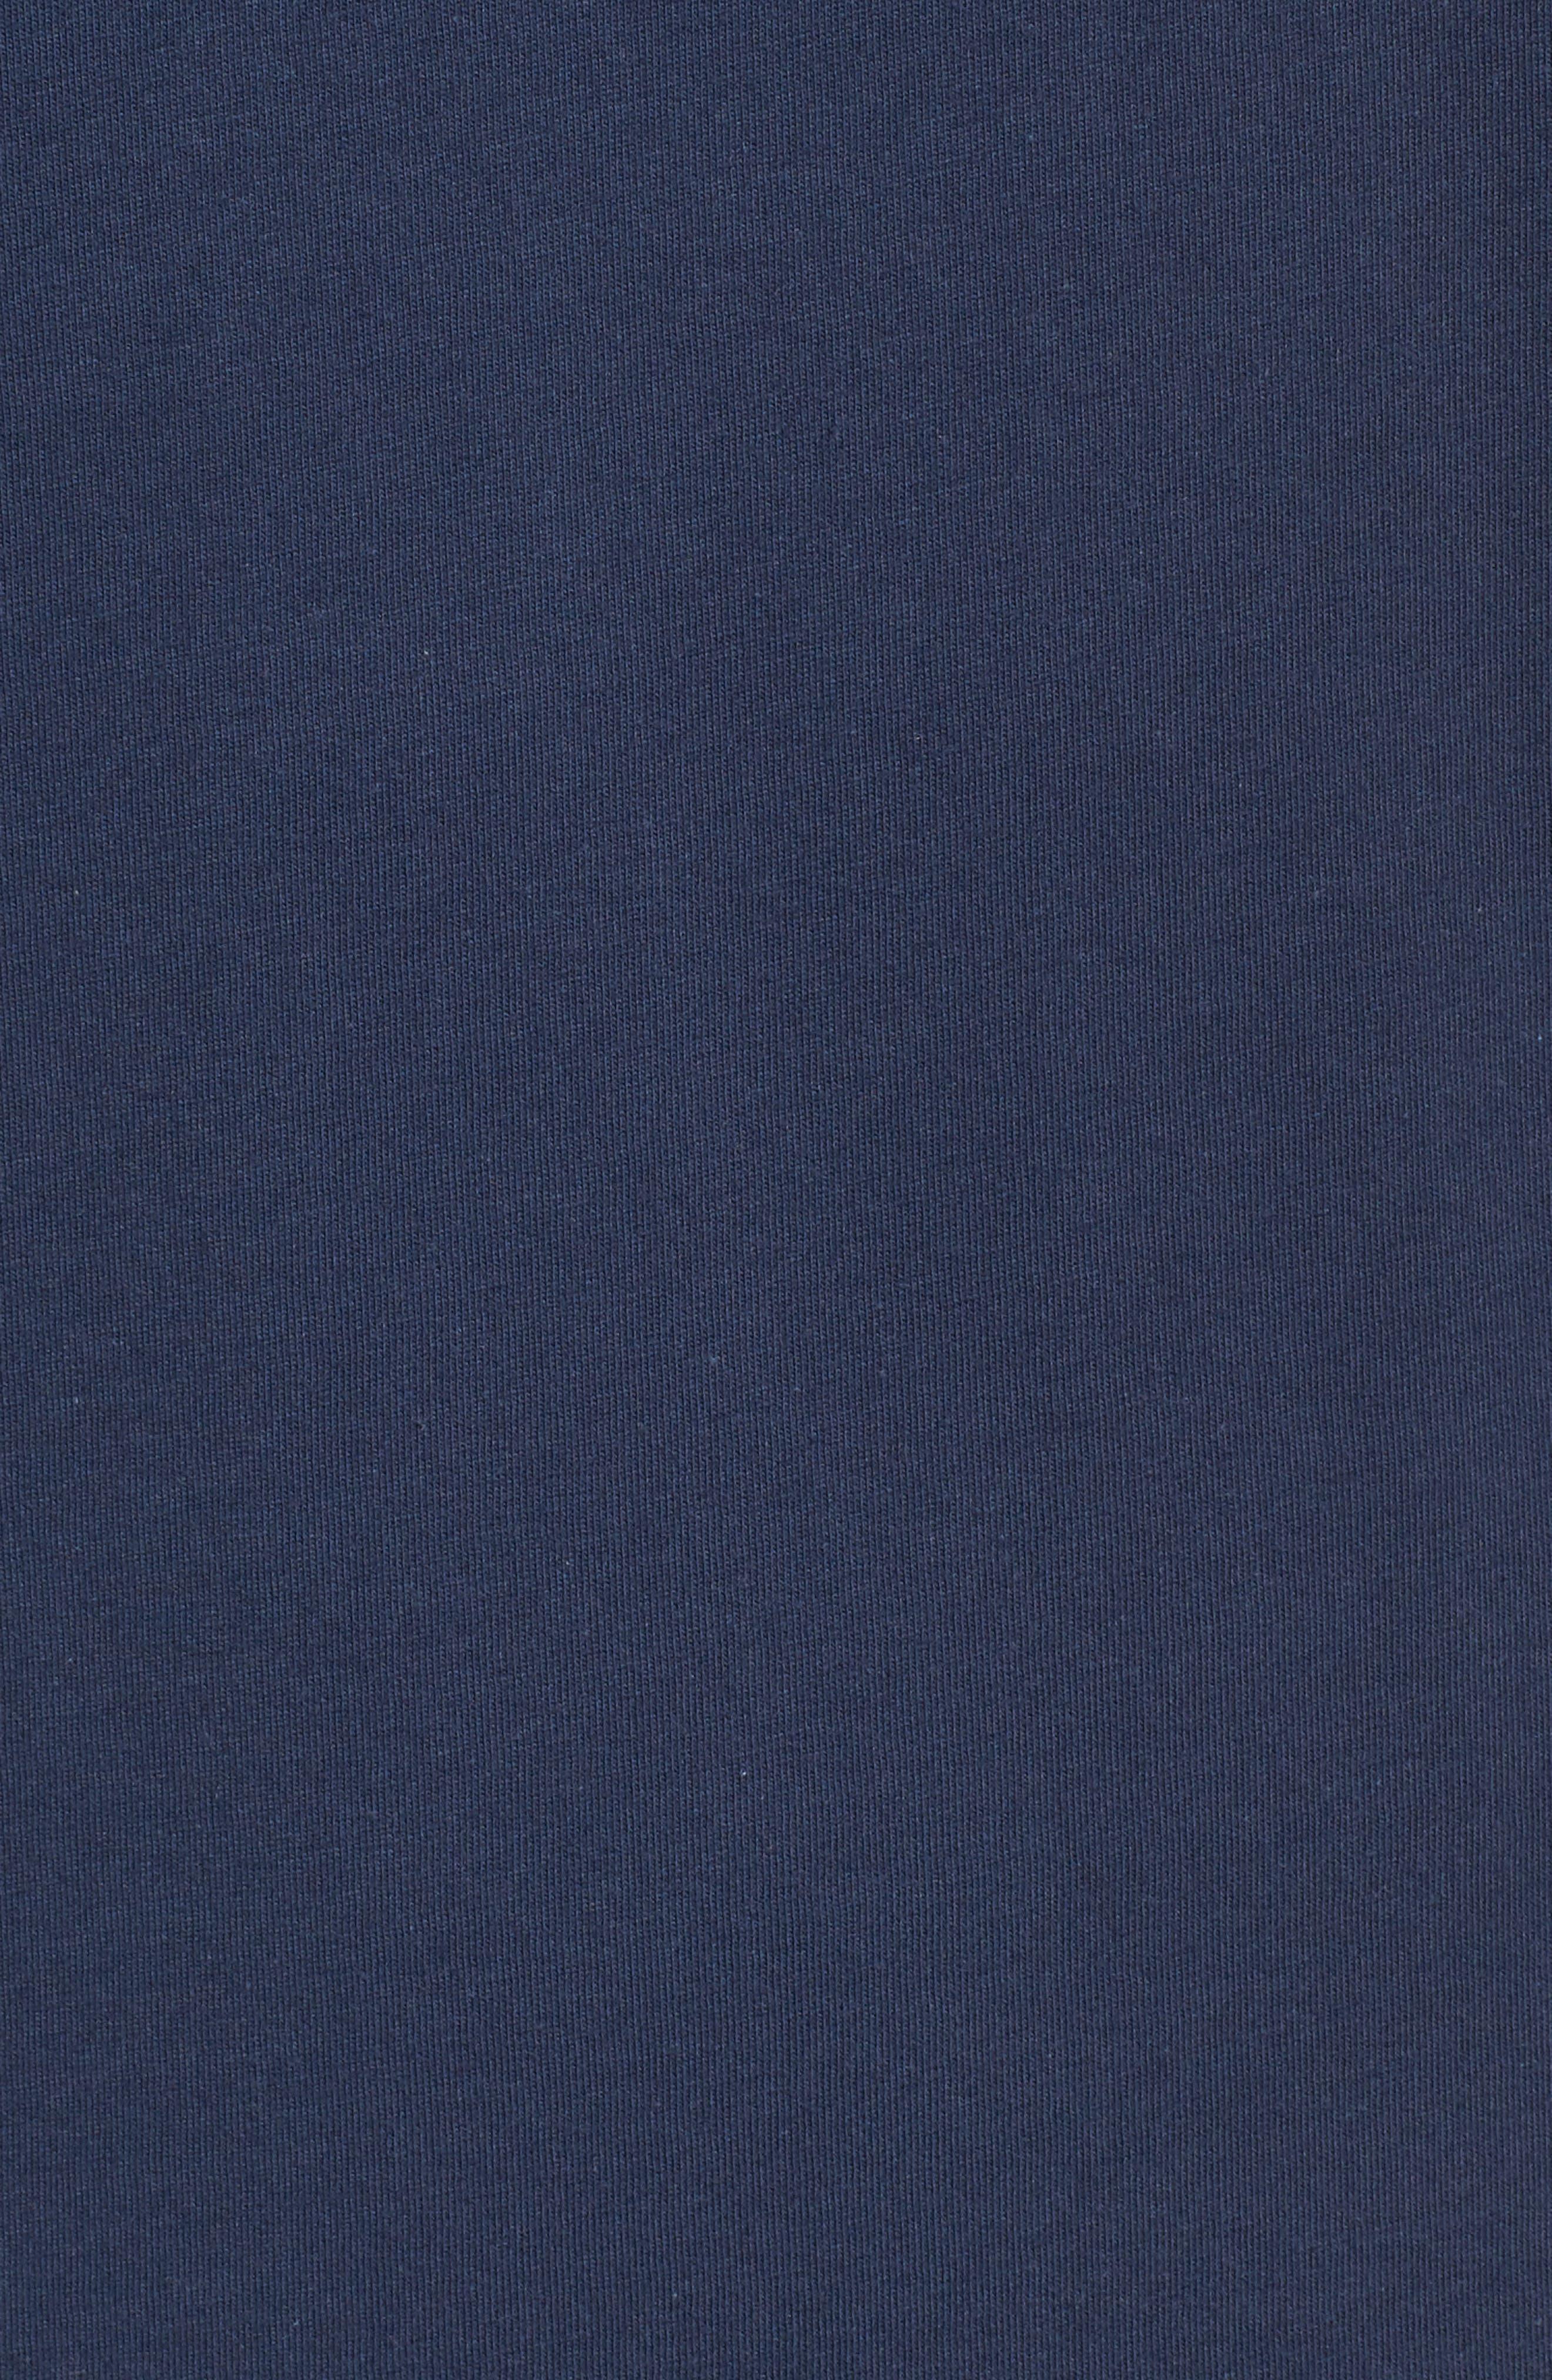 Hypnotics T-Shirt,                             Alternate thumbnail 5, color,                             Dress Blues